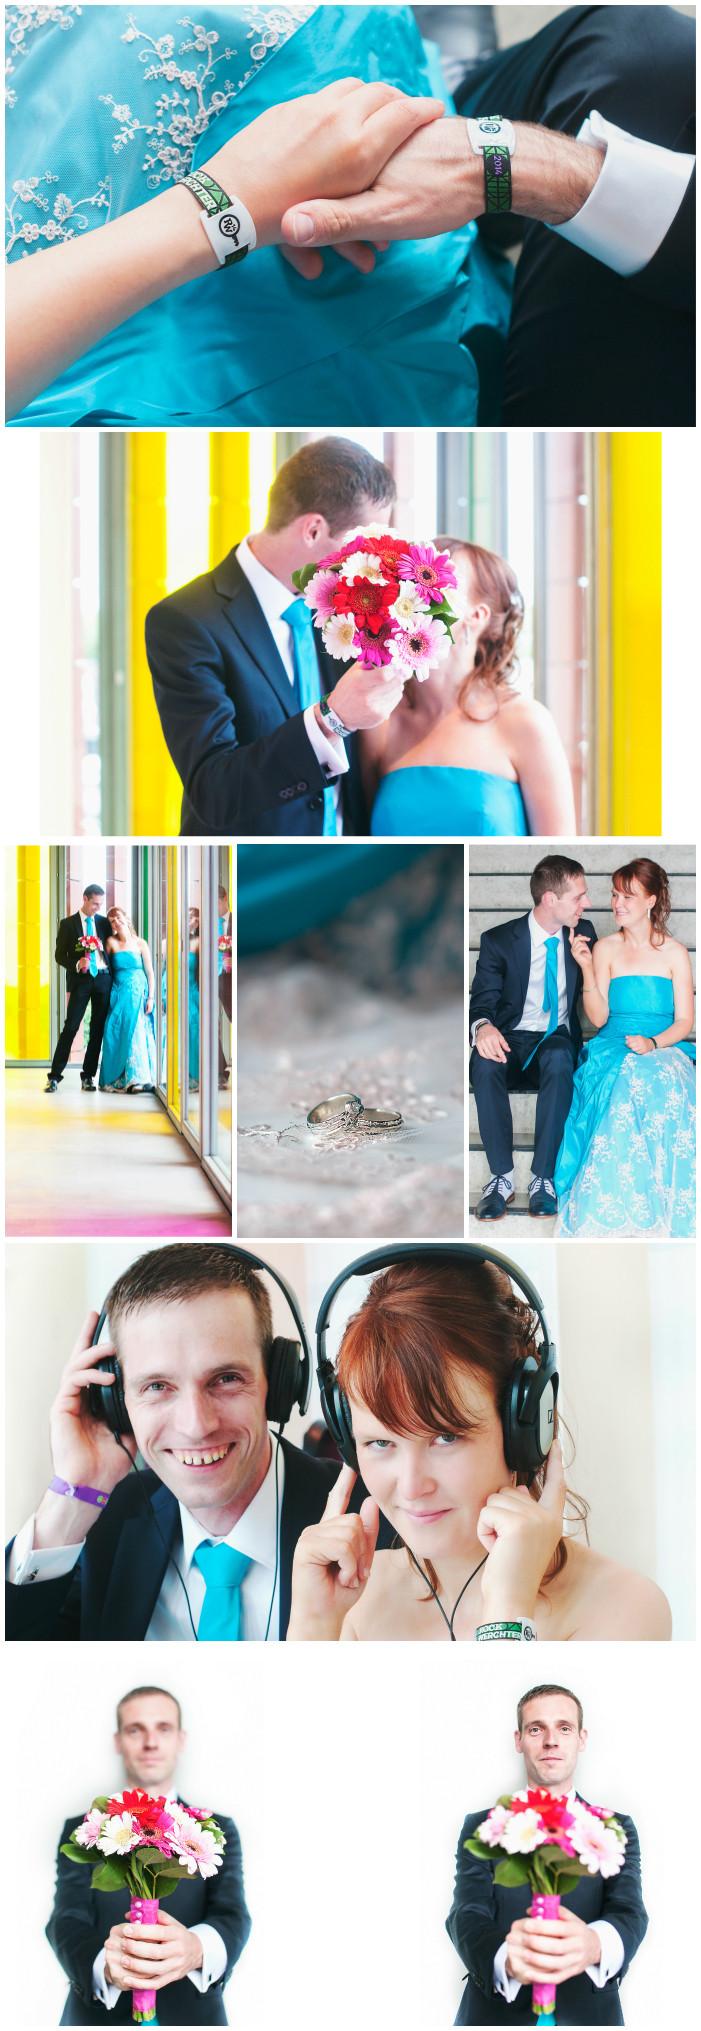 Huwelijksreportage in Brugge (c) Silvie Bonne